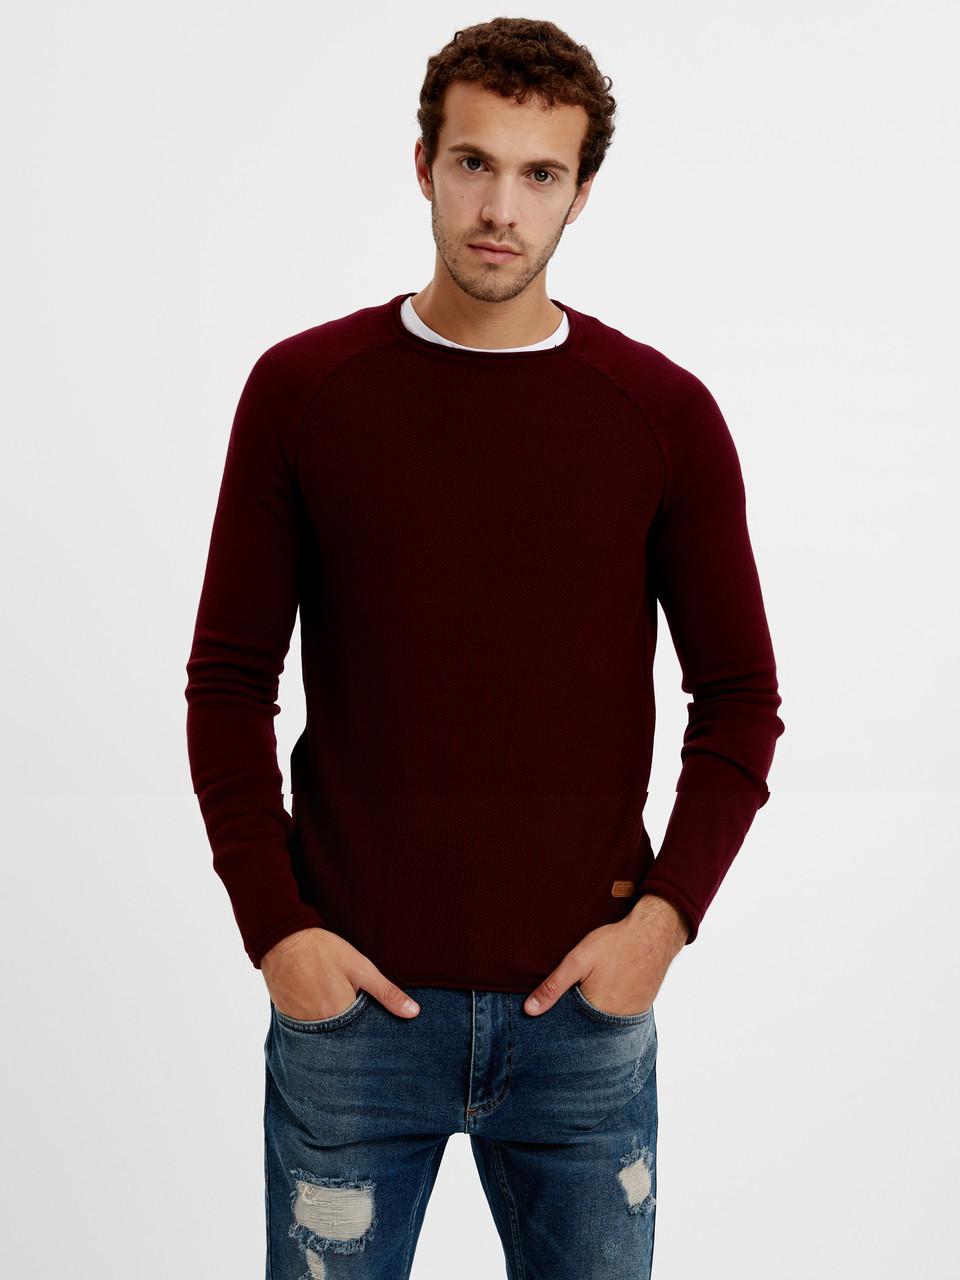 Бордовый мужской свитер LC Waikiki / ЛС Вайкики с круглой горловиной